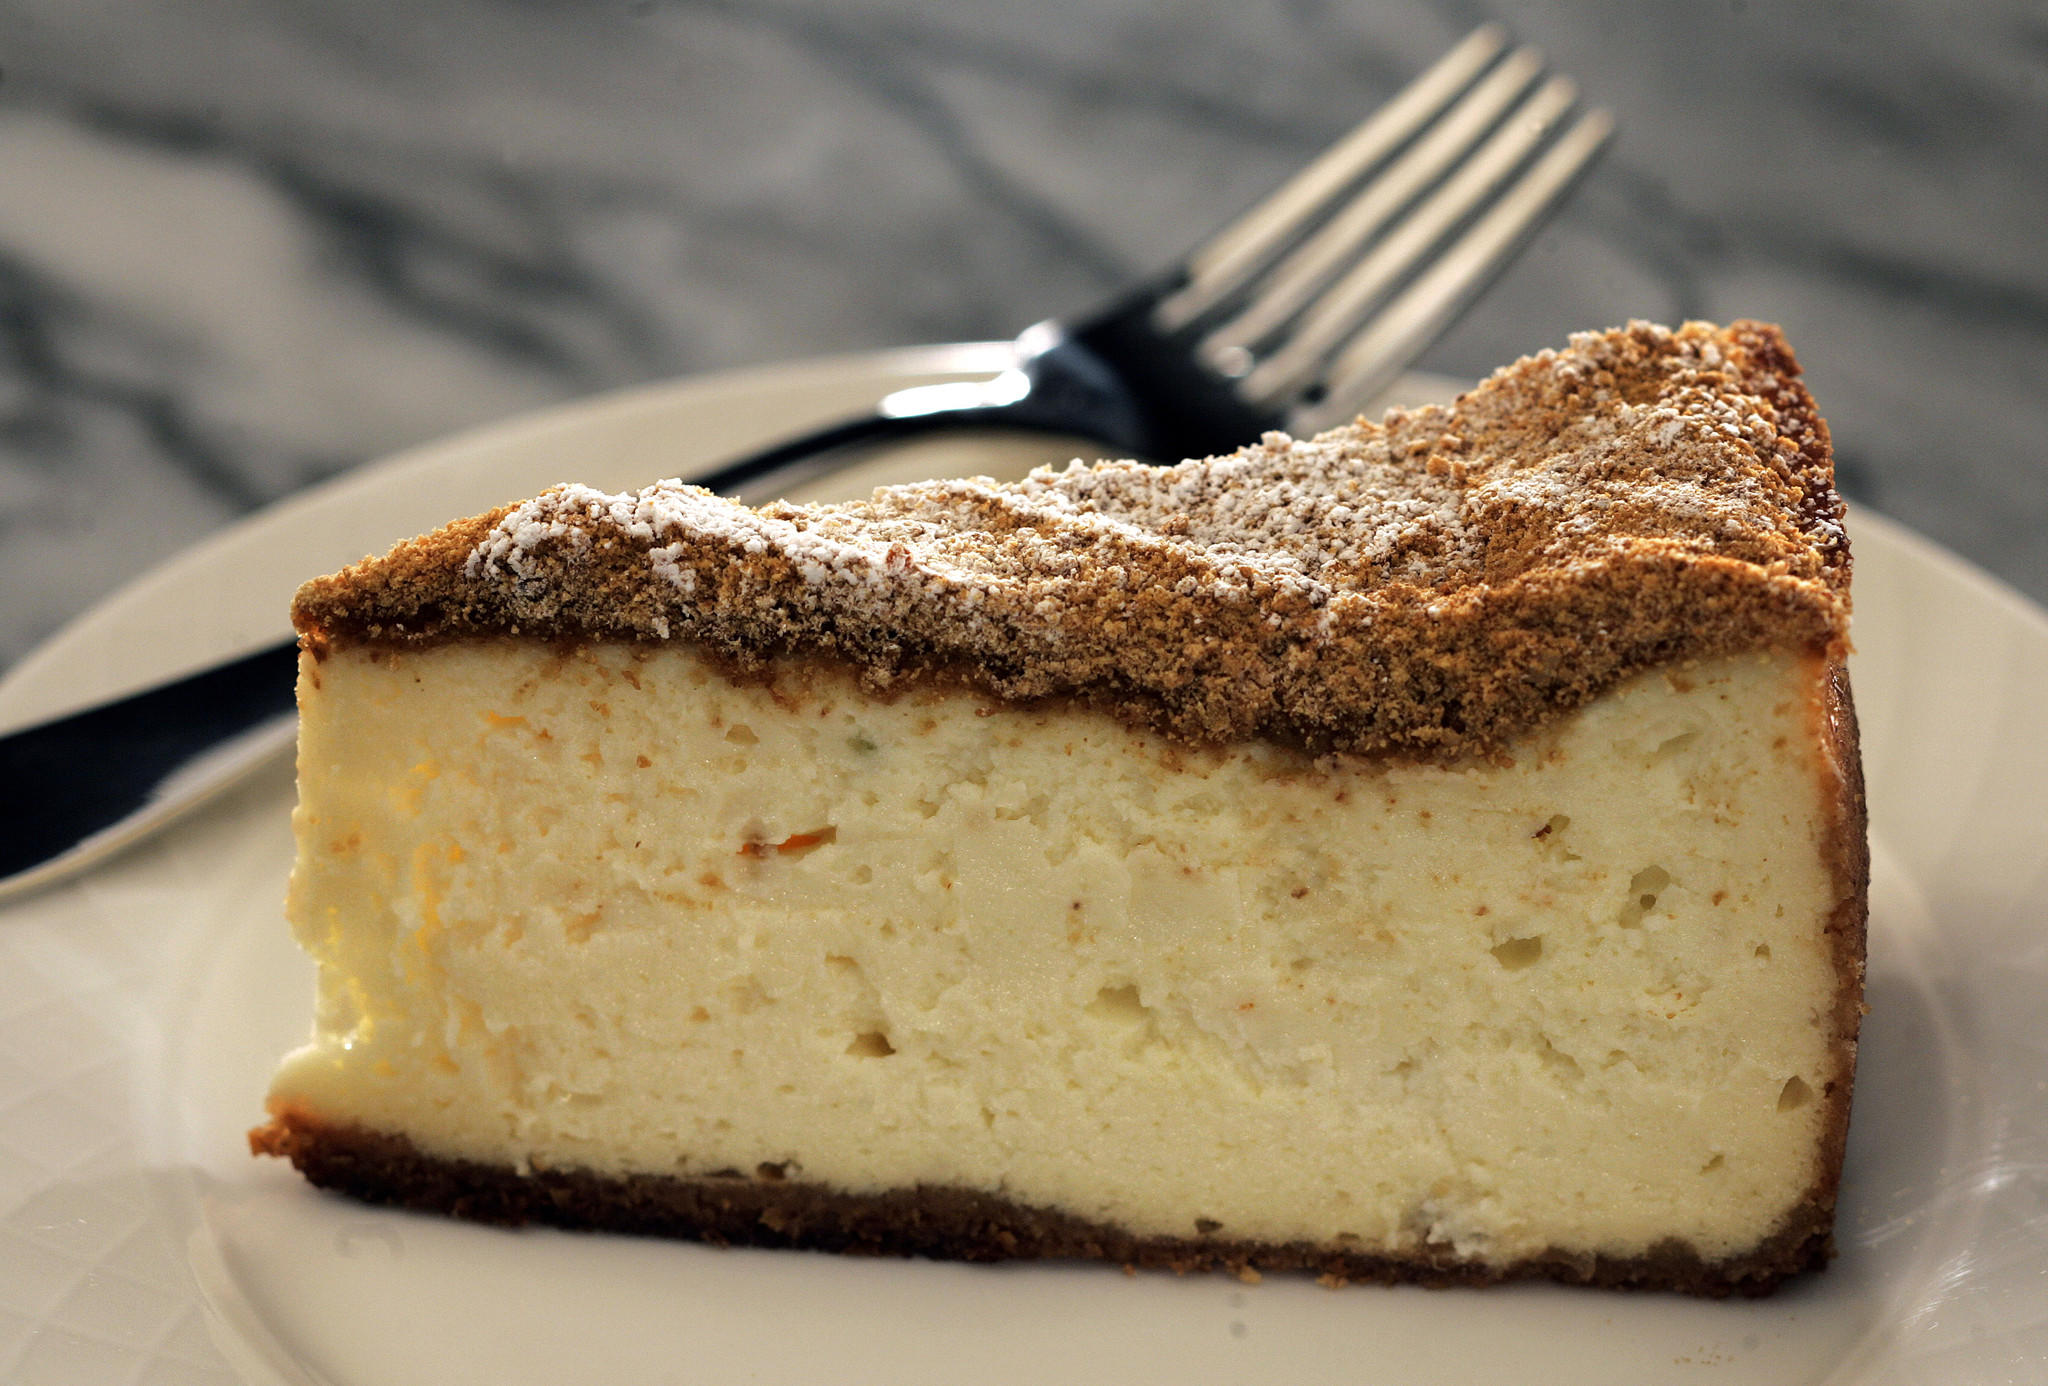 ricotta cheesecake recipe recipes marino times angeles los russian alike california cookbook melcon mel